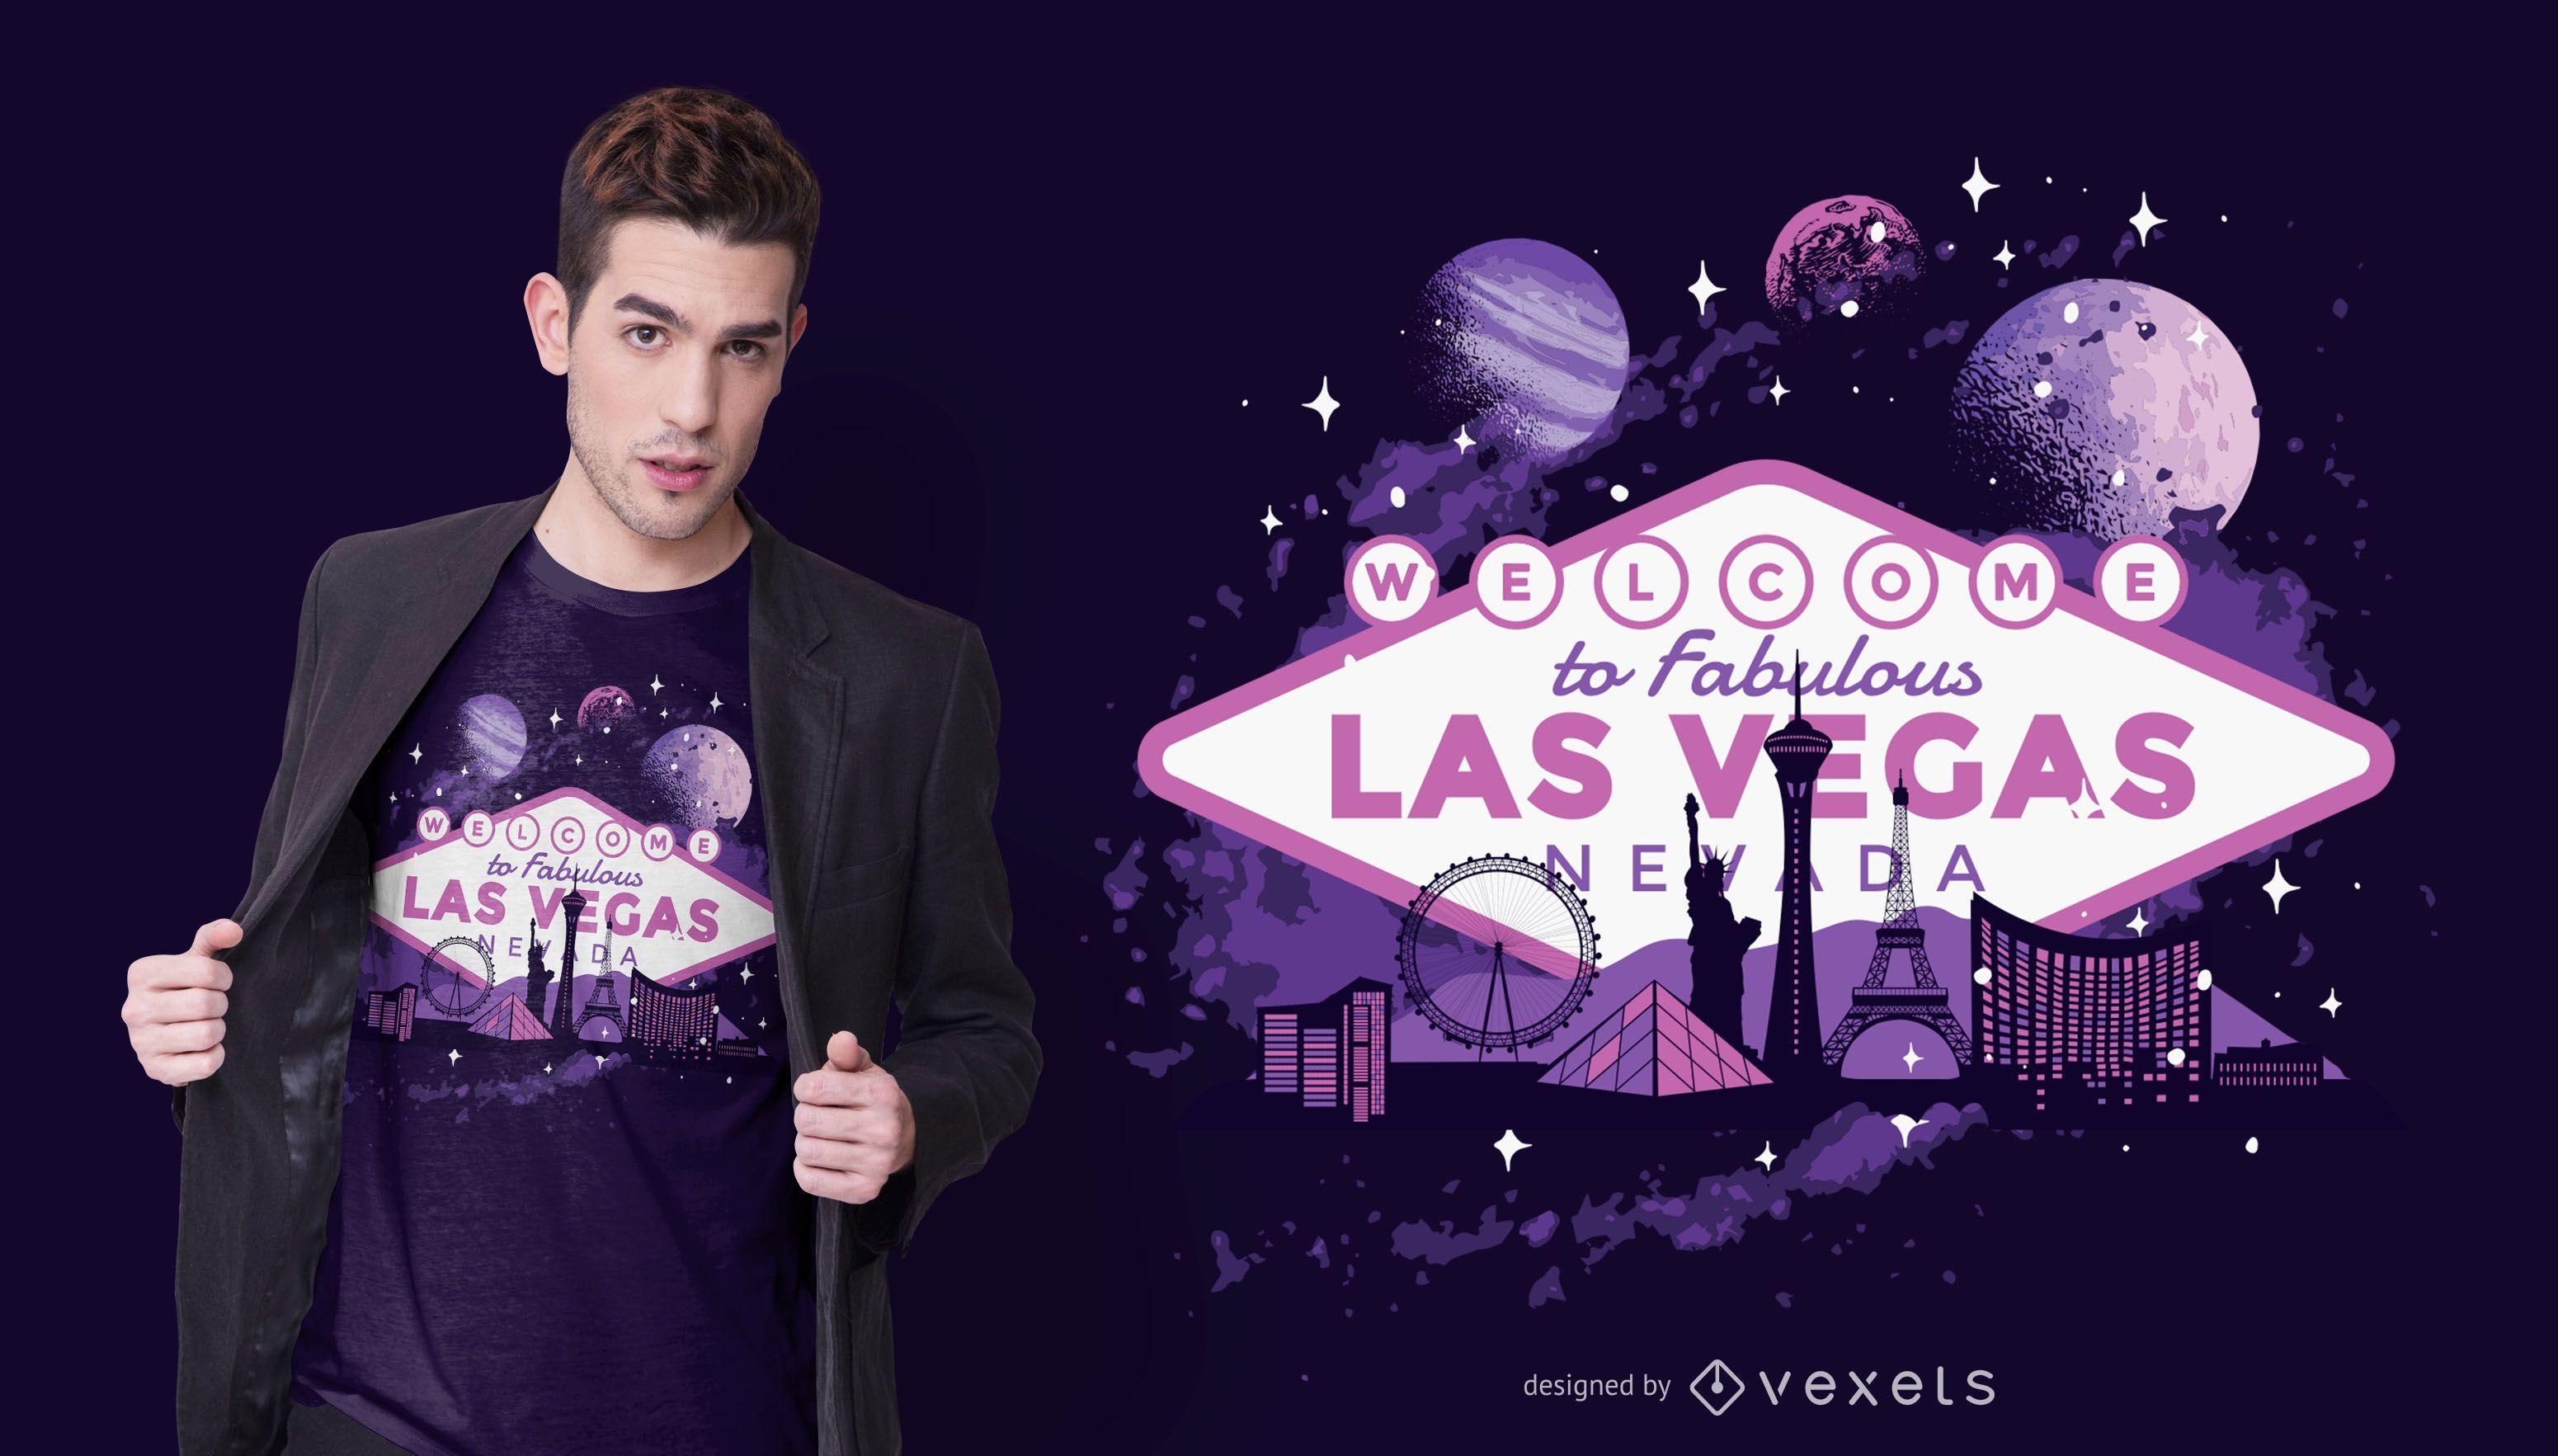 Las vegas t-shirt design